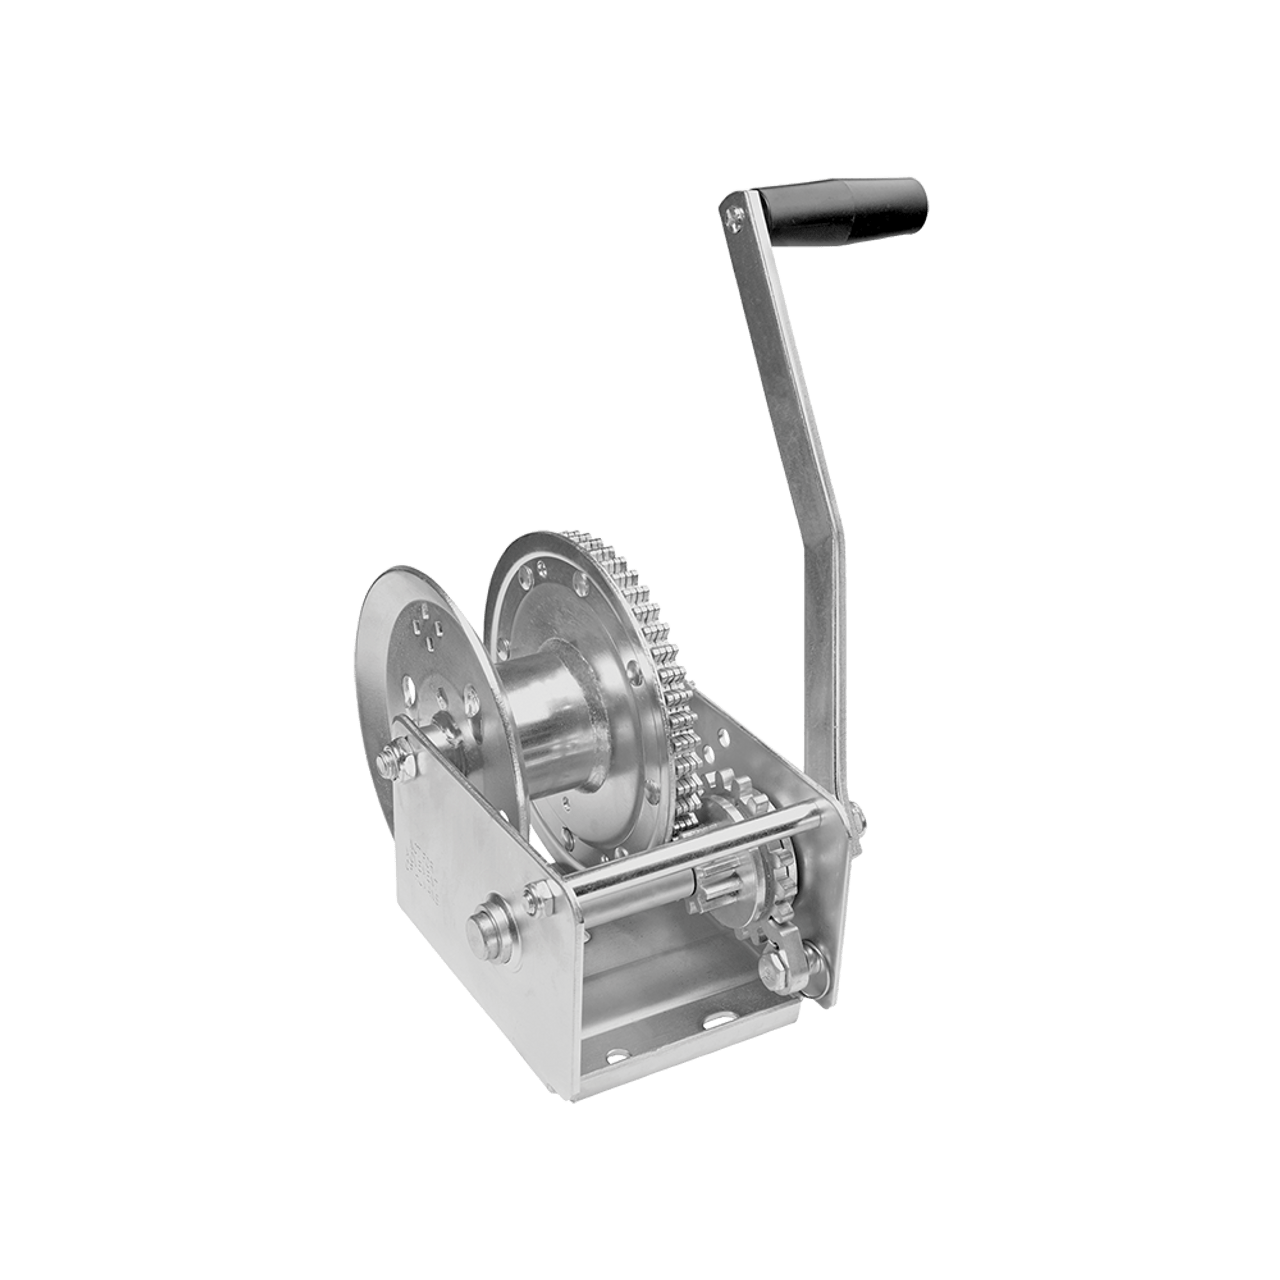 fulton boat trailer wiring diagram wiring diagram gp143100 fulton single speed winch with automatic brake 1 500 [ 1280 x 1280 Pixel ]